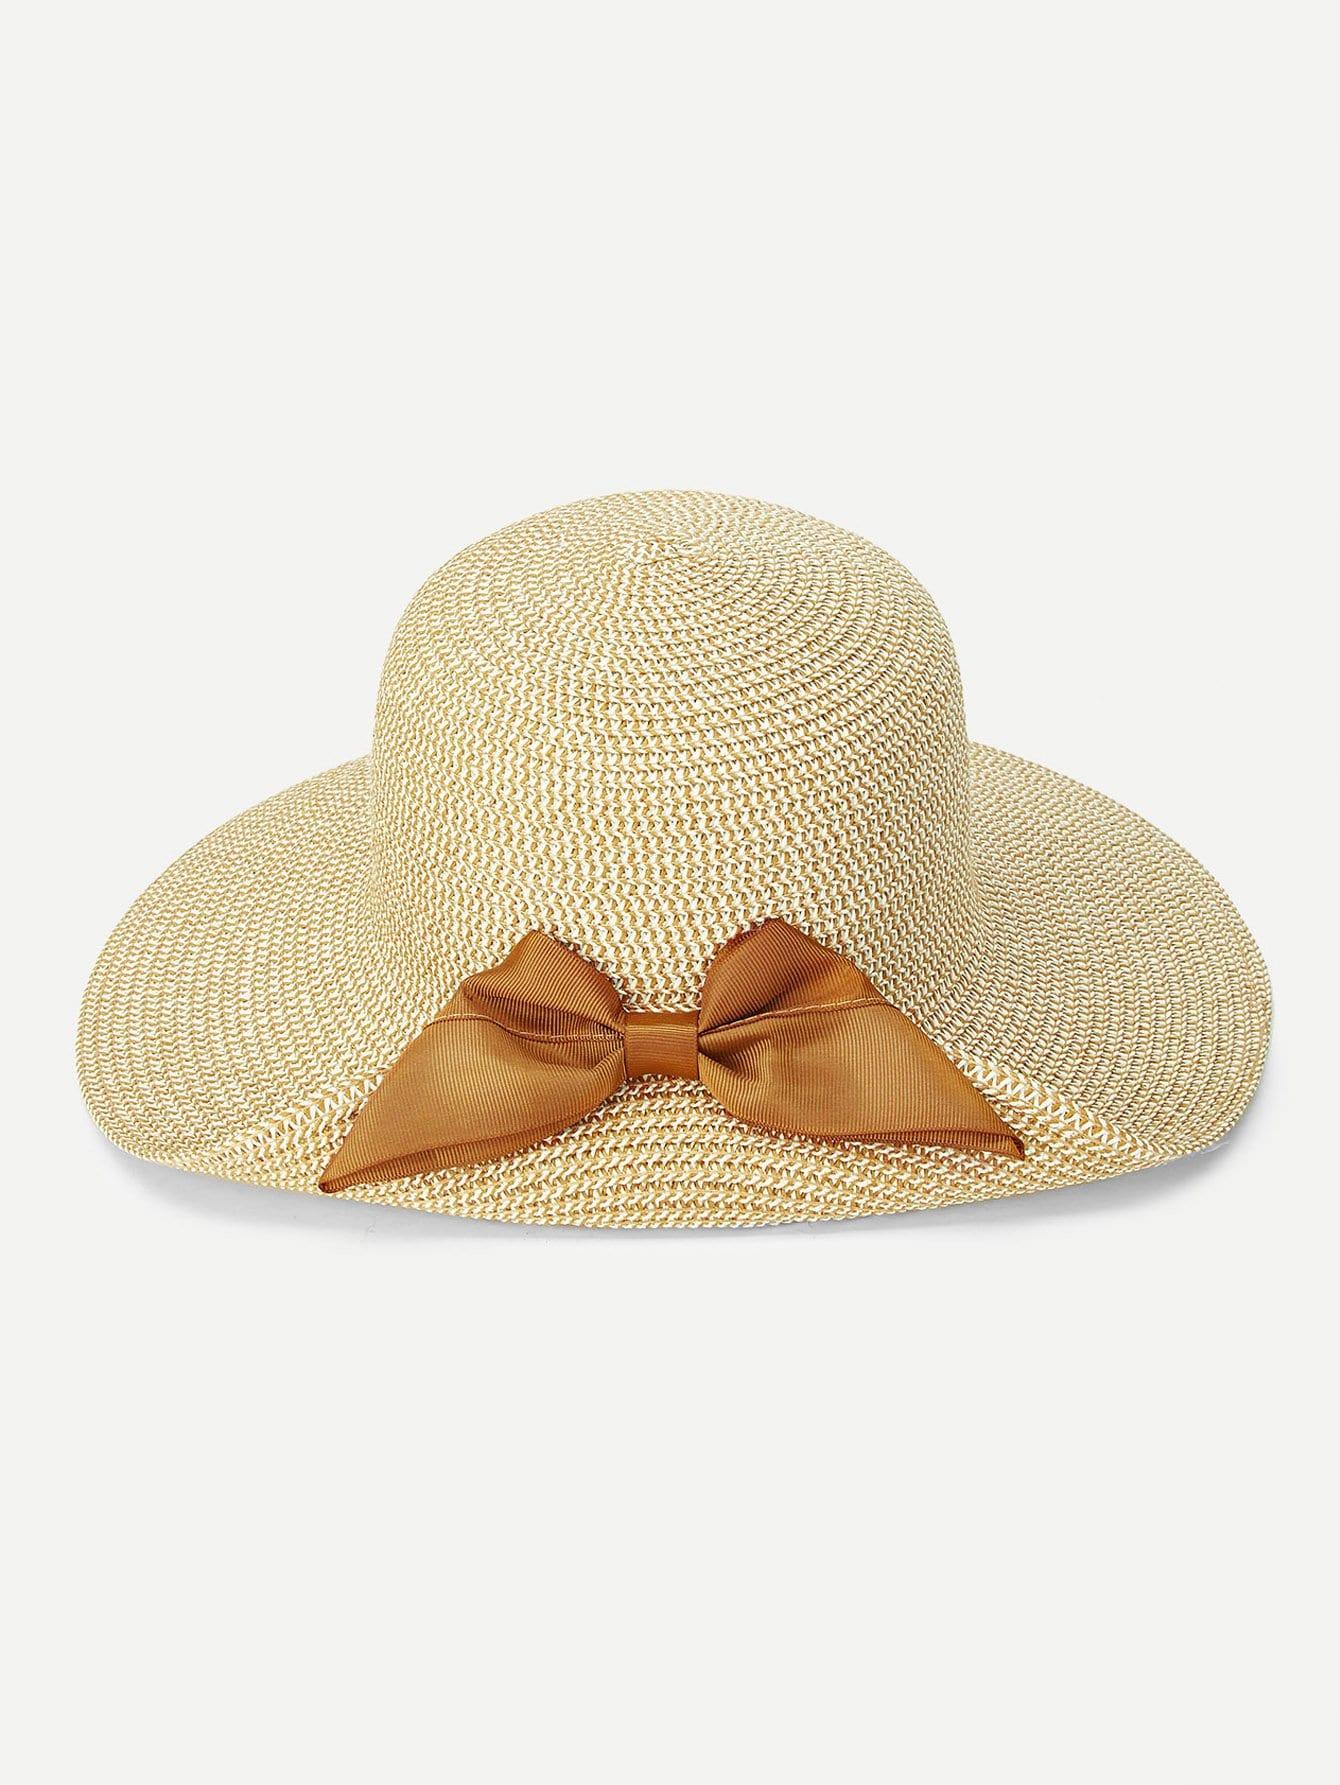 Bow Decorated Straw Hat bird decorated straw hat